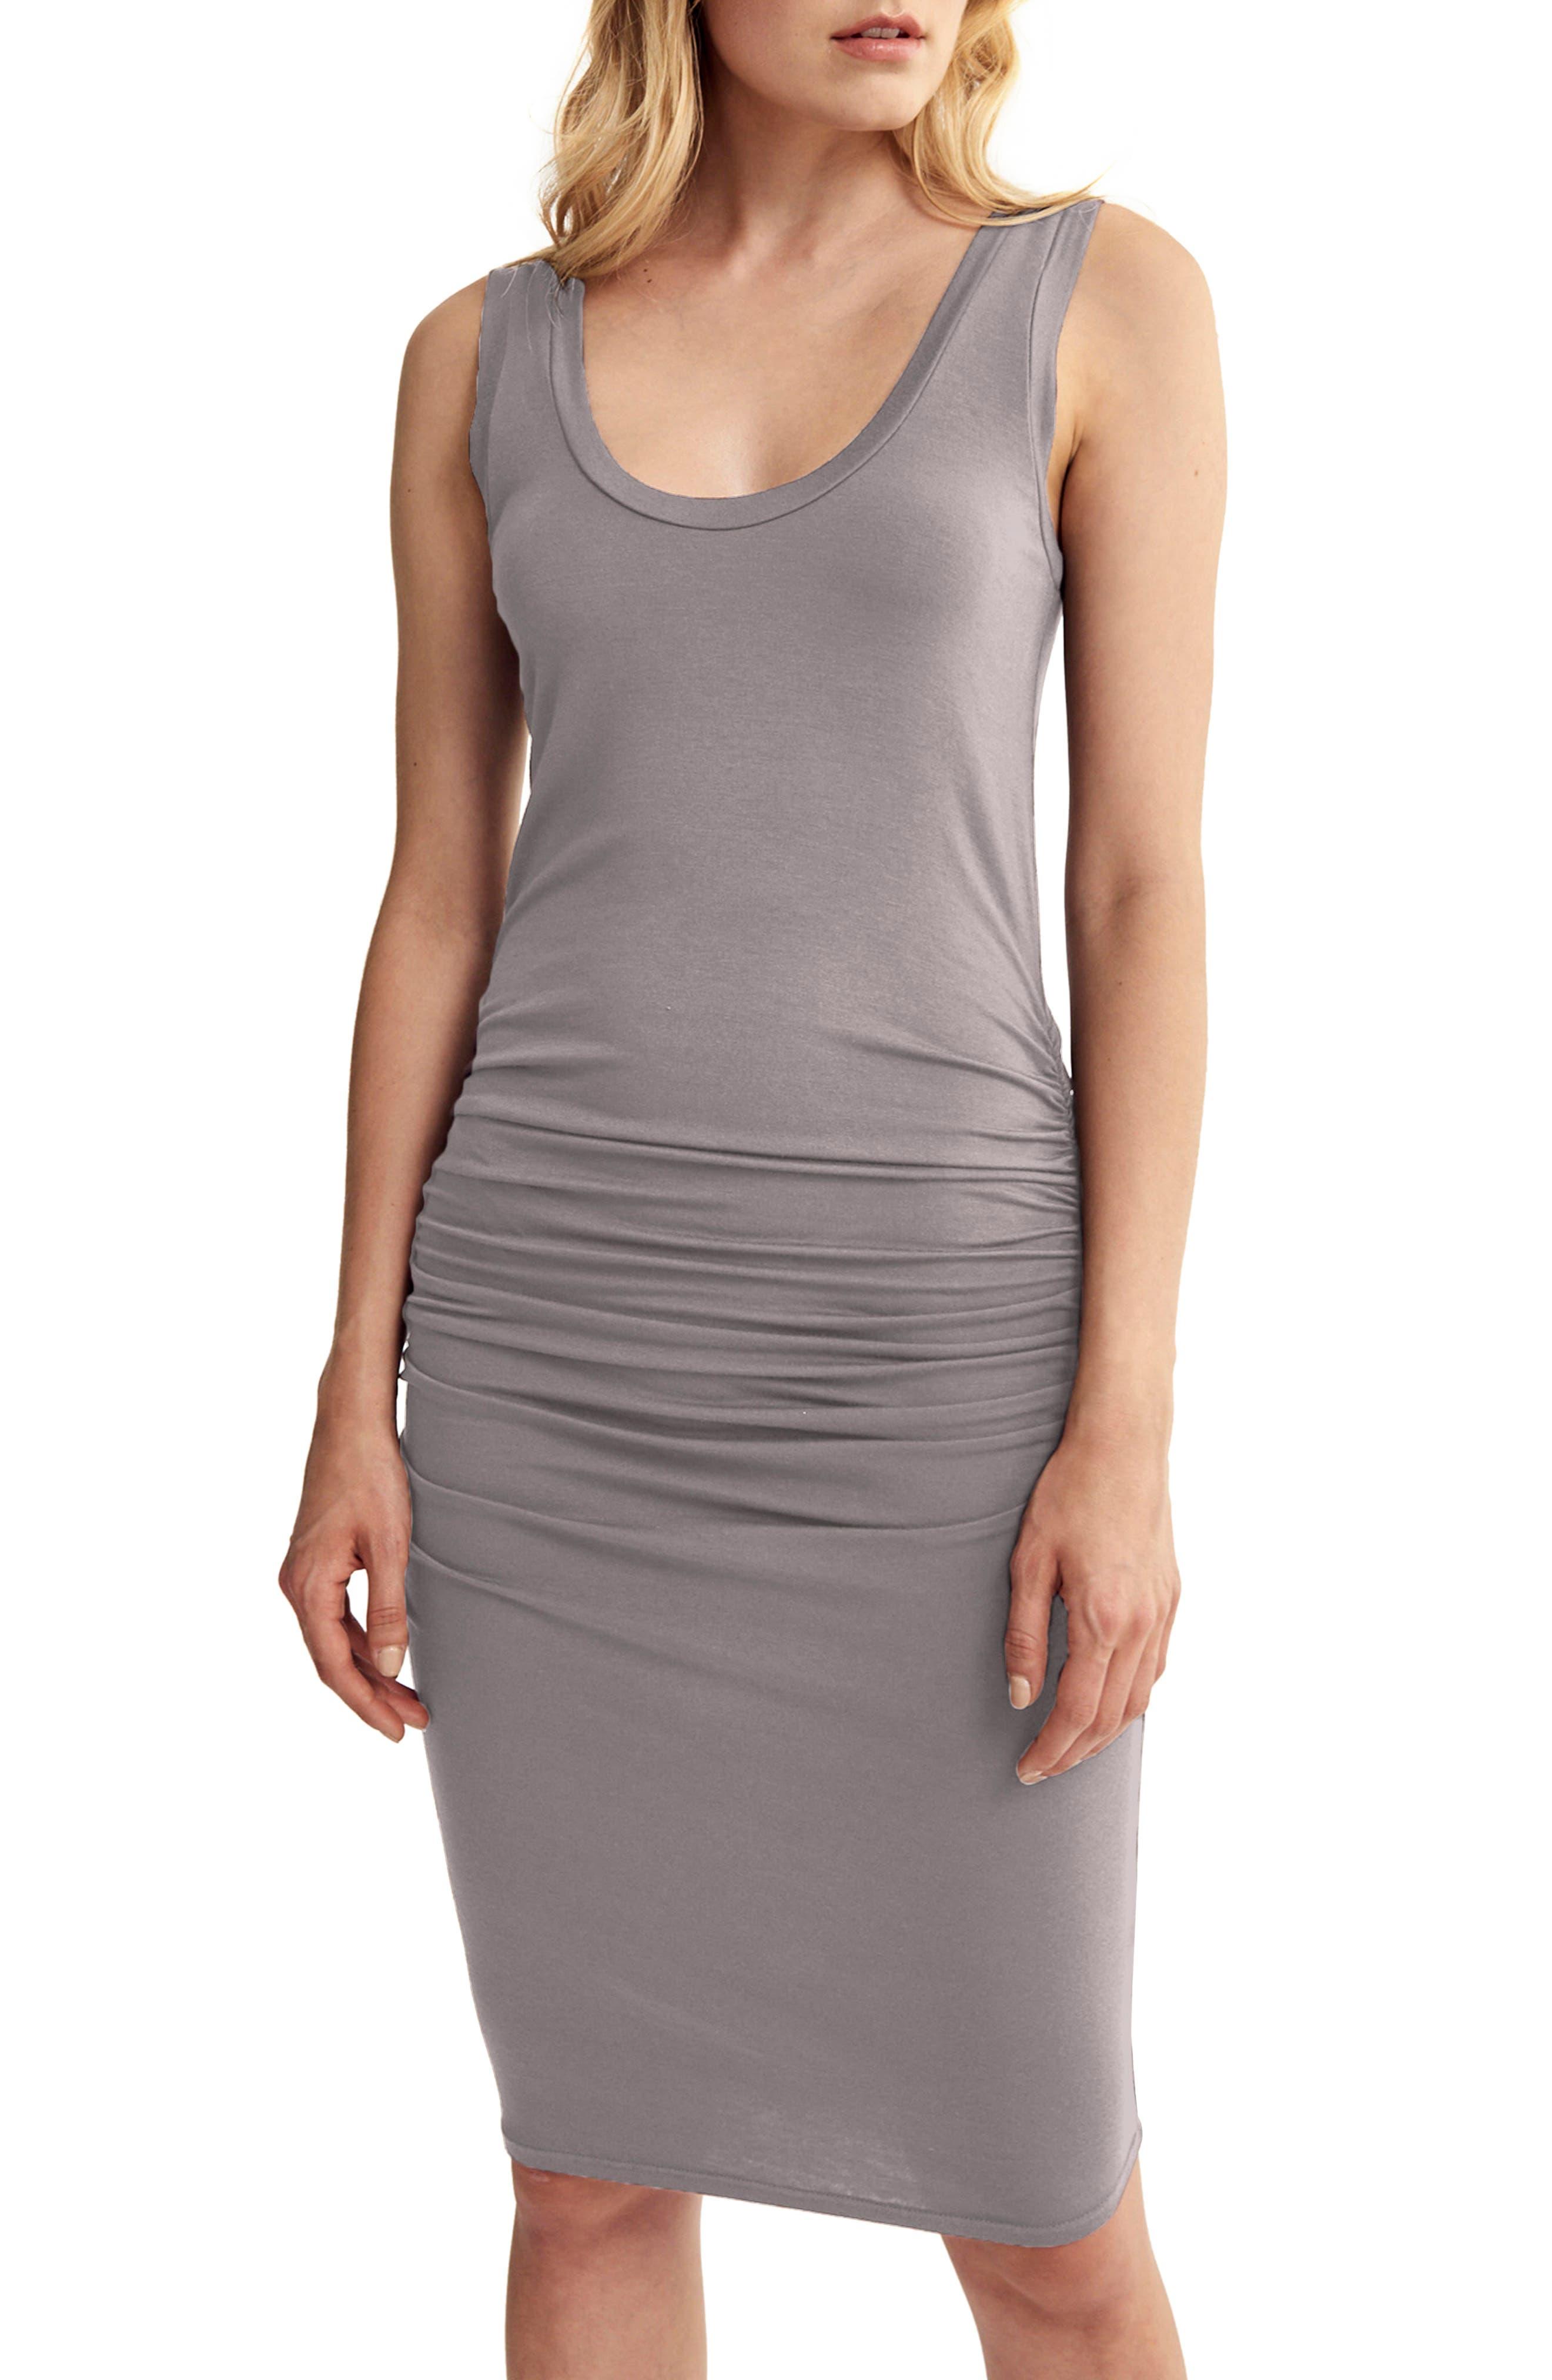 Main Image - LAmade 'Frankie' Ruched Tank Dress